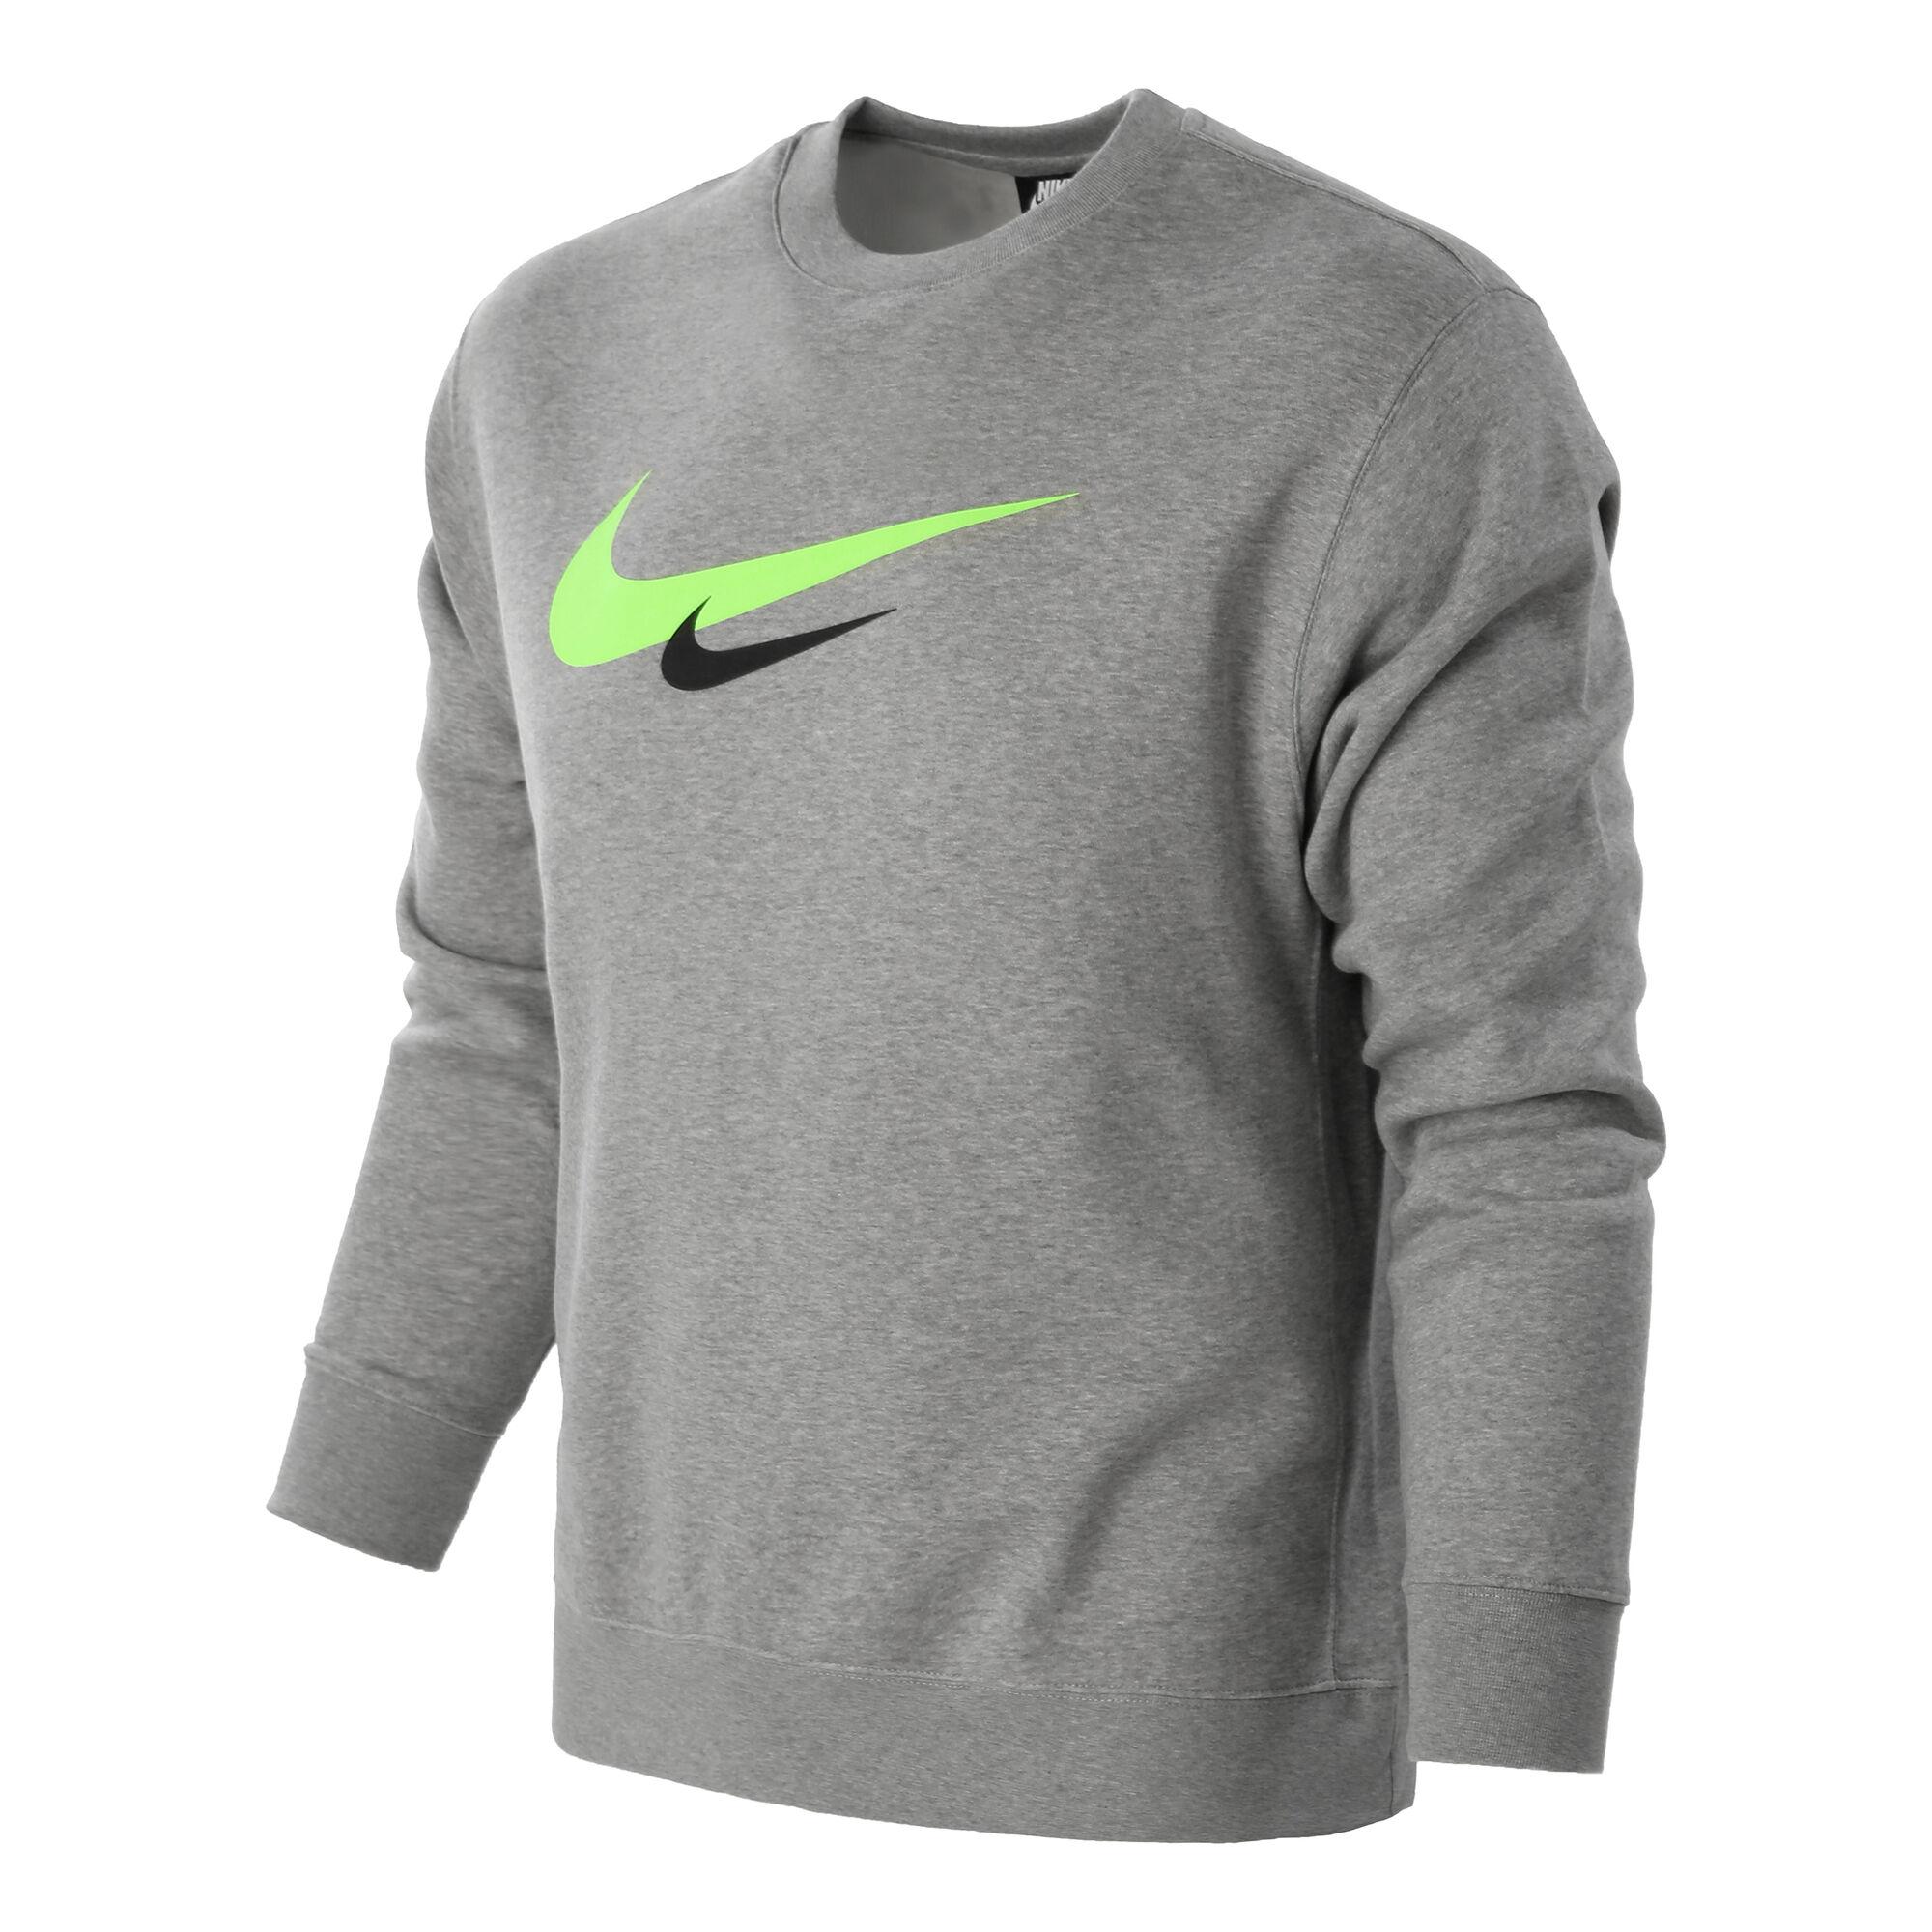 Nike Sweatshirt Grau Herren